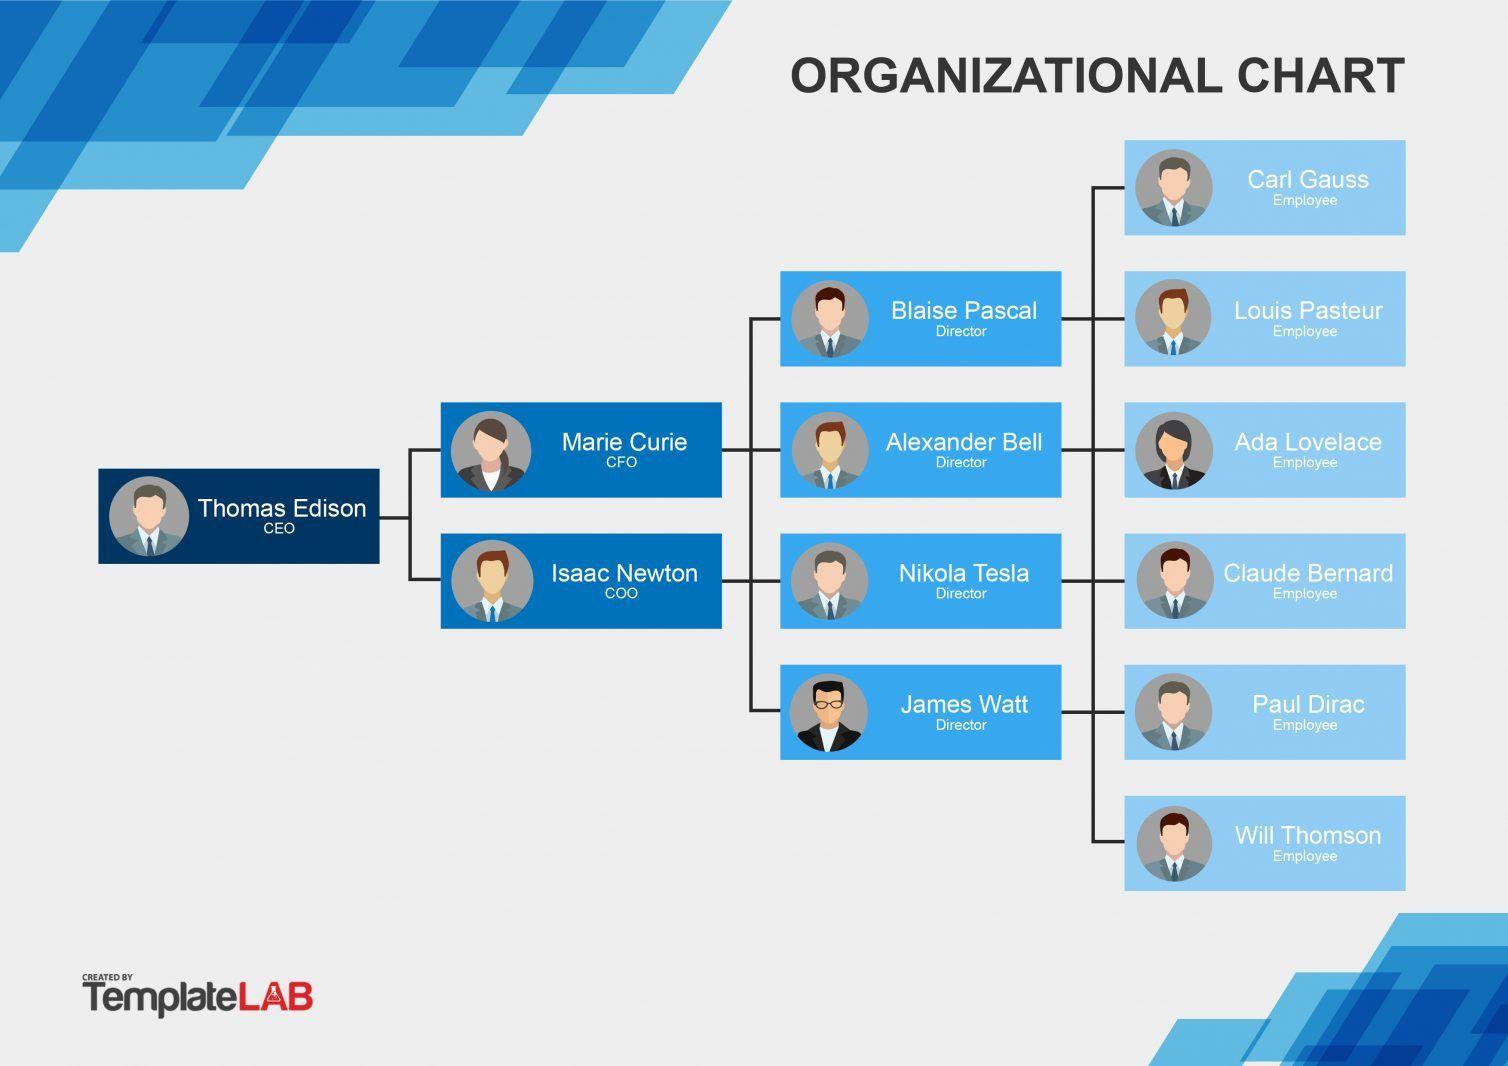 008 Wonderful Microsoft Office Organizational Chart Template Idea  Templates Flow ExcelFull